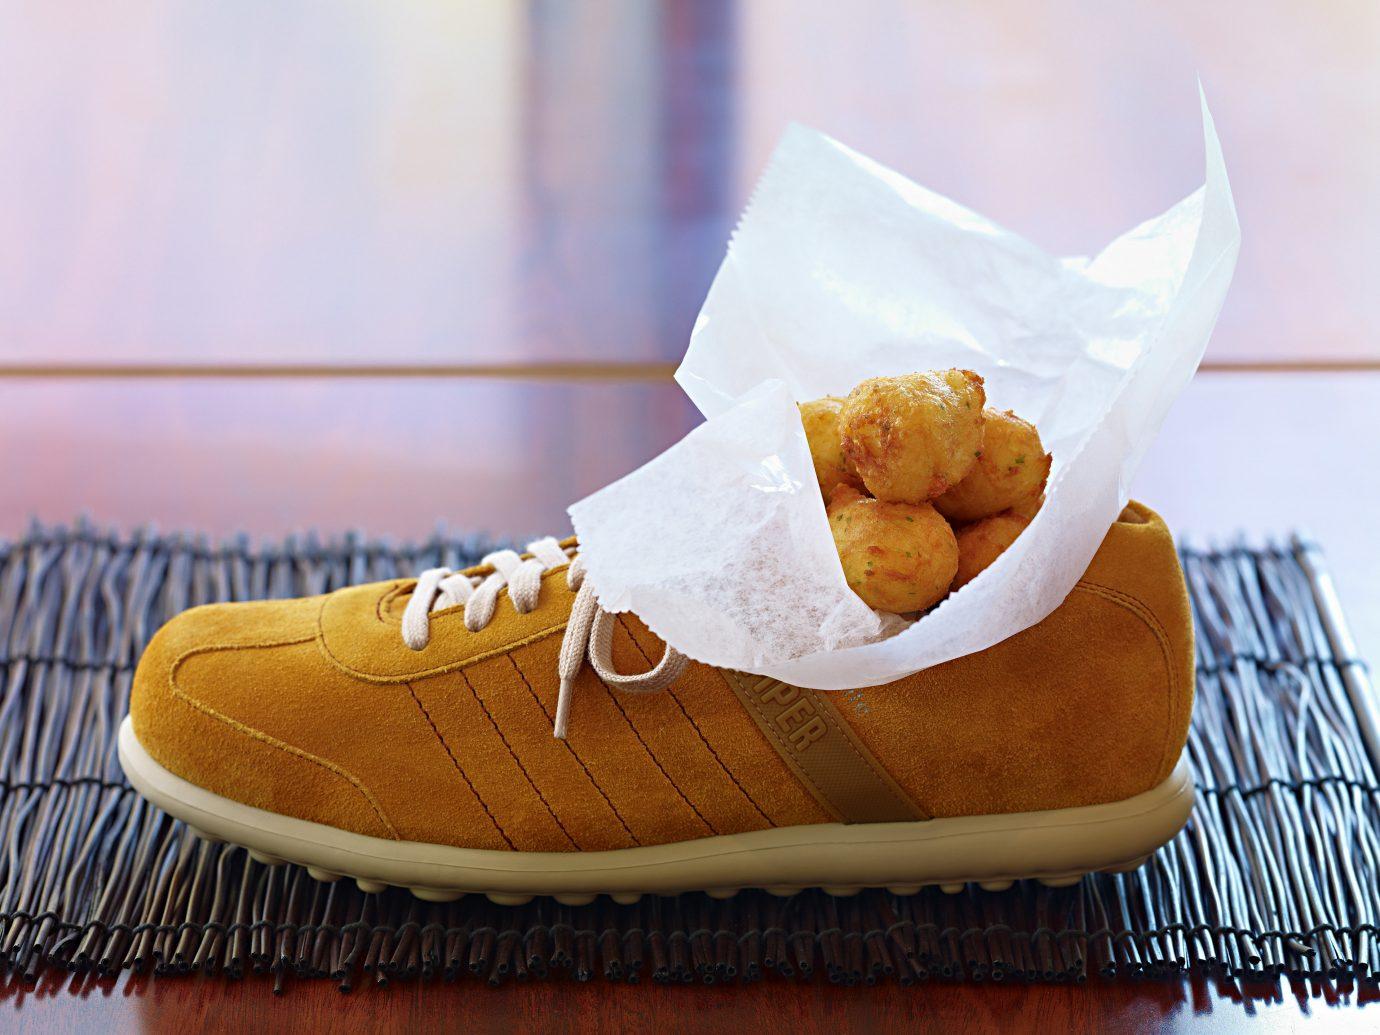 Food + Drink footwear yellow food shoe land plant produce dish sense leg flowering plant flavor